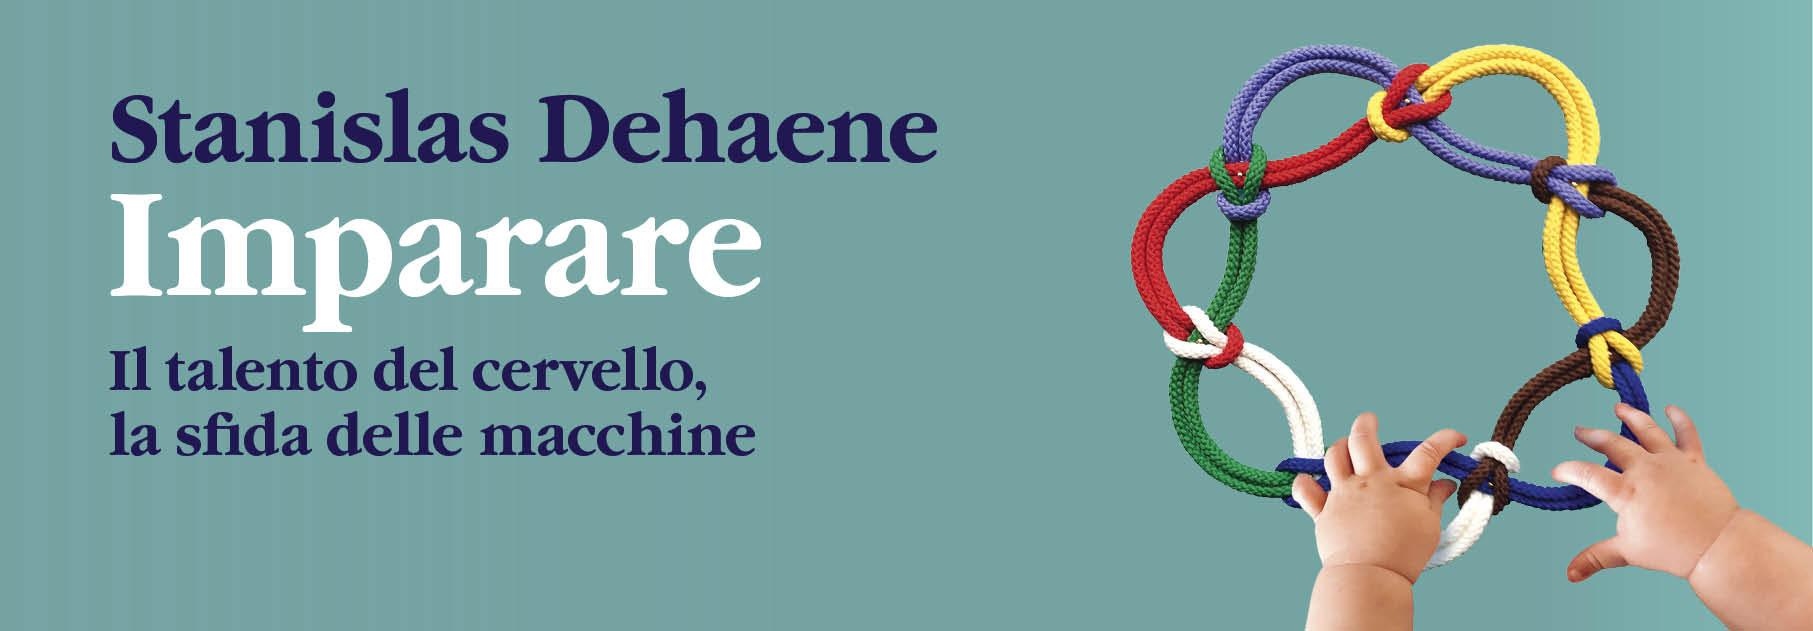 Stanislas Dehaene - Imparare